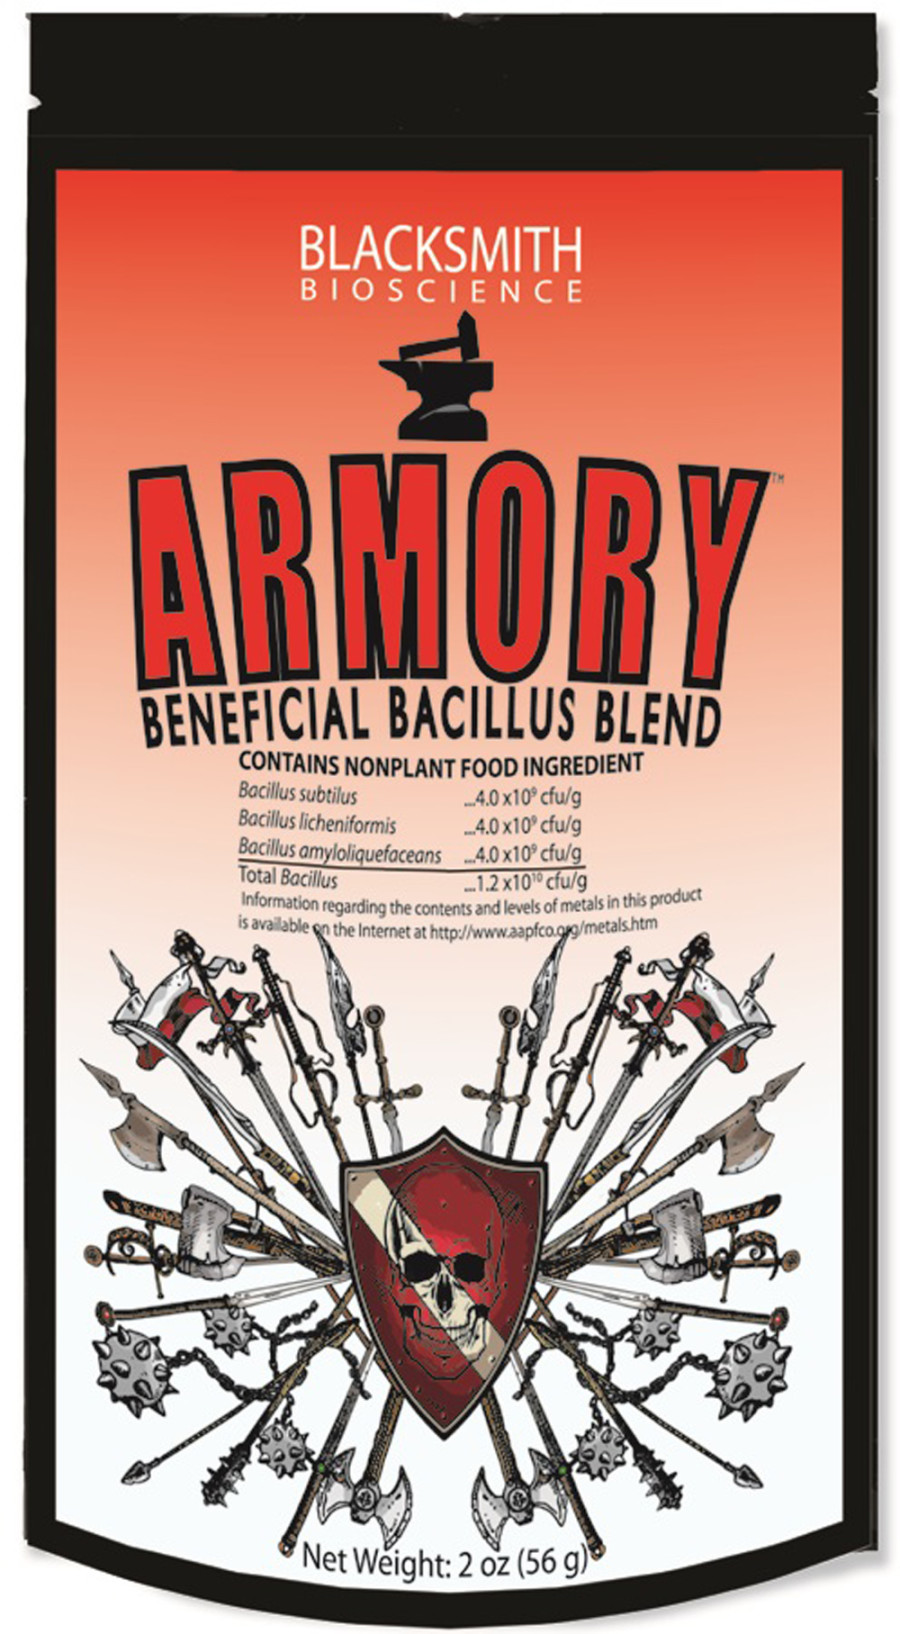 Blacksmith Bioscience Armory Beneficial Bacillus Blend 12ea/2 oz